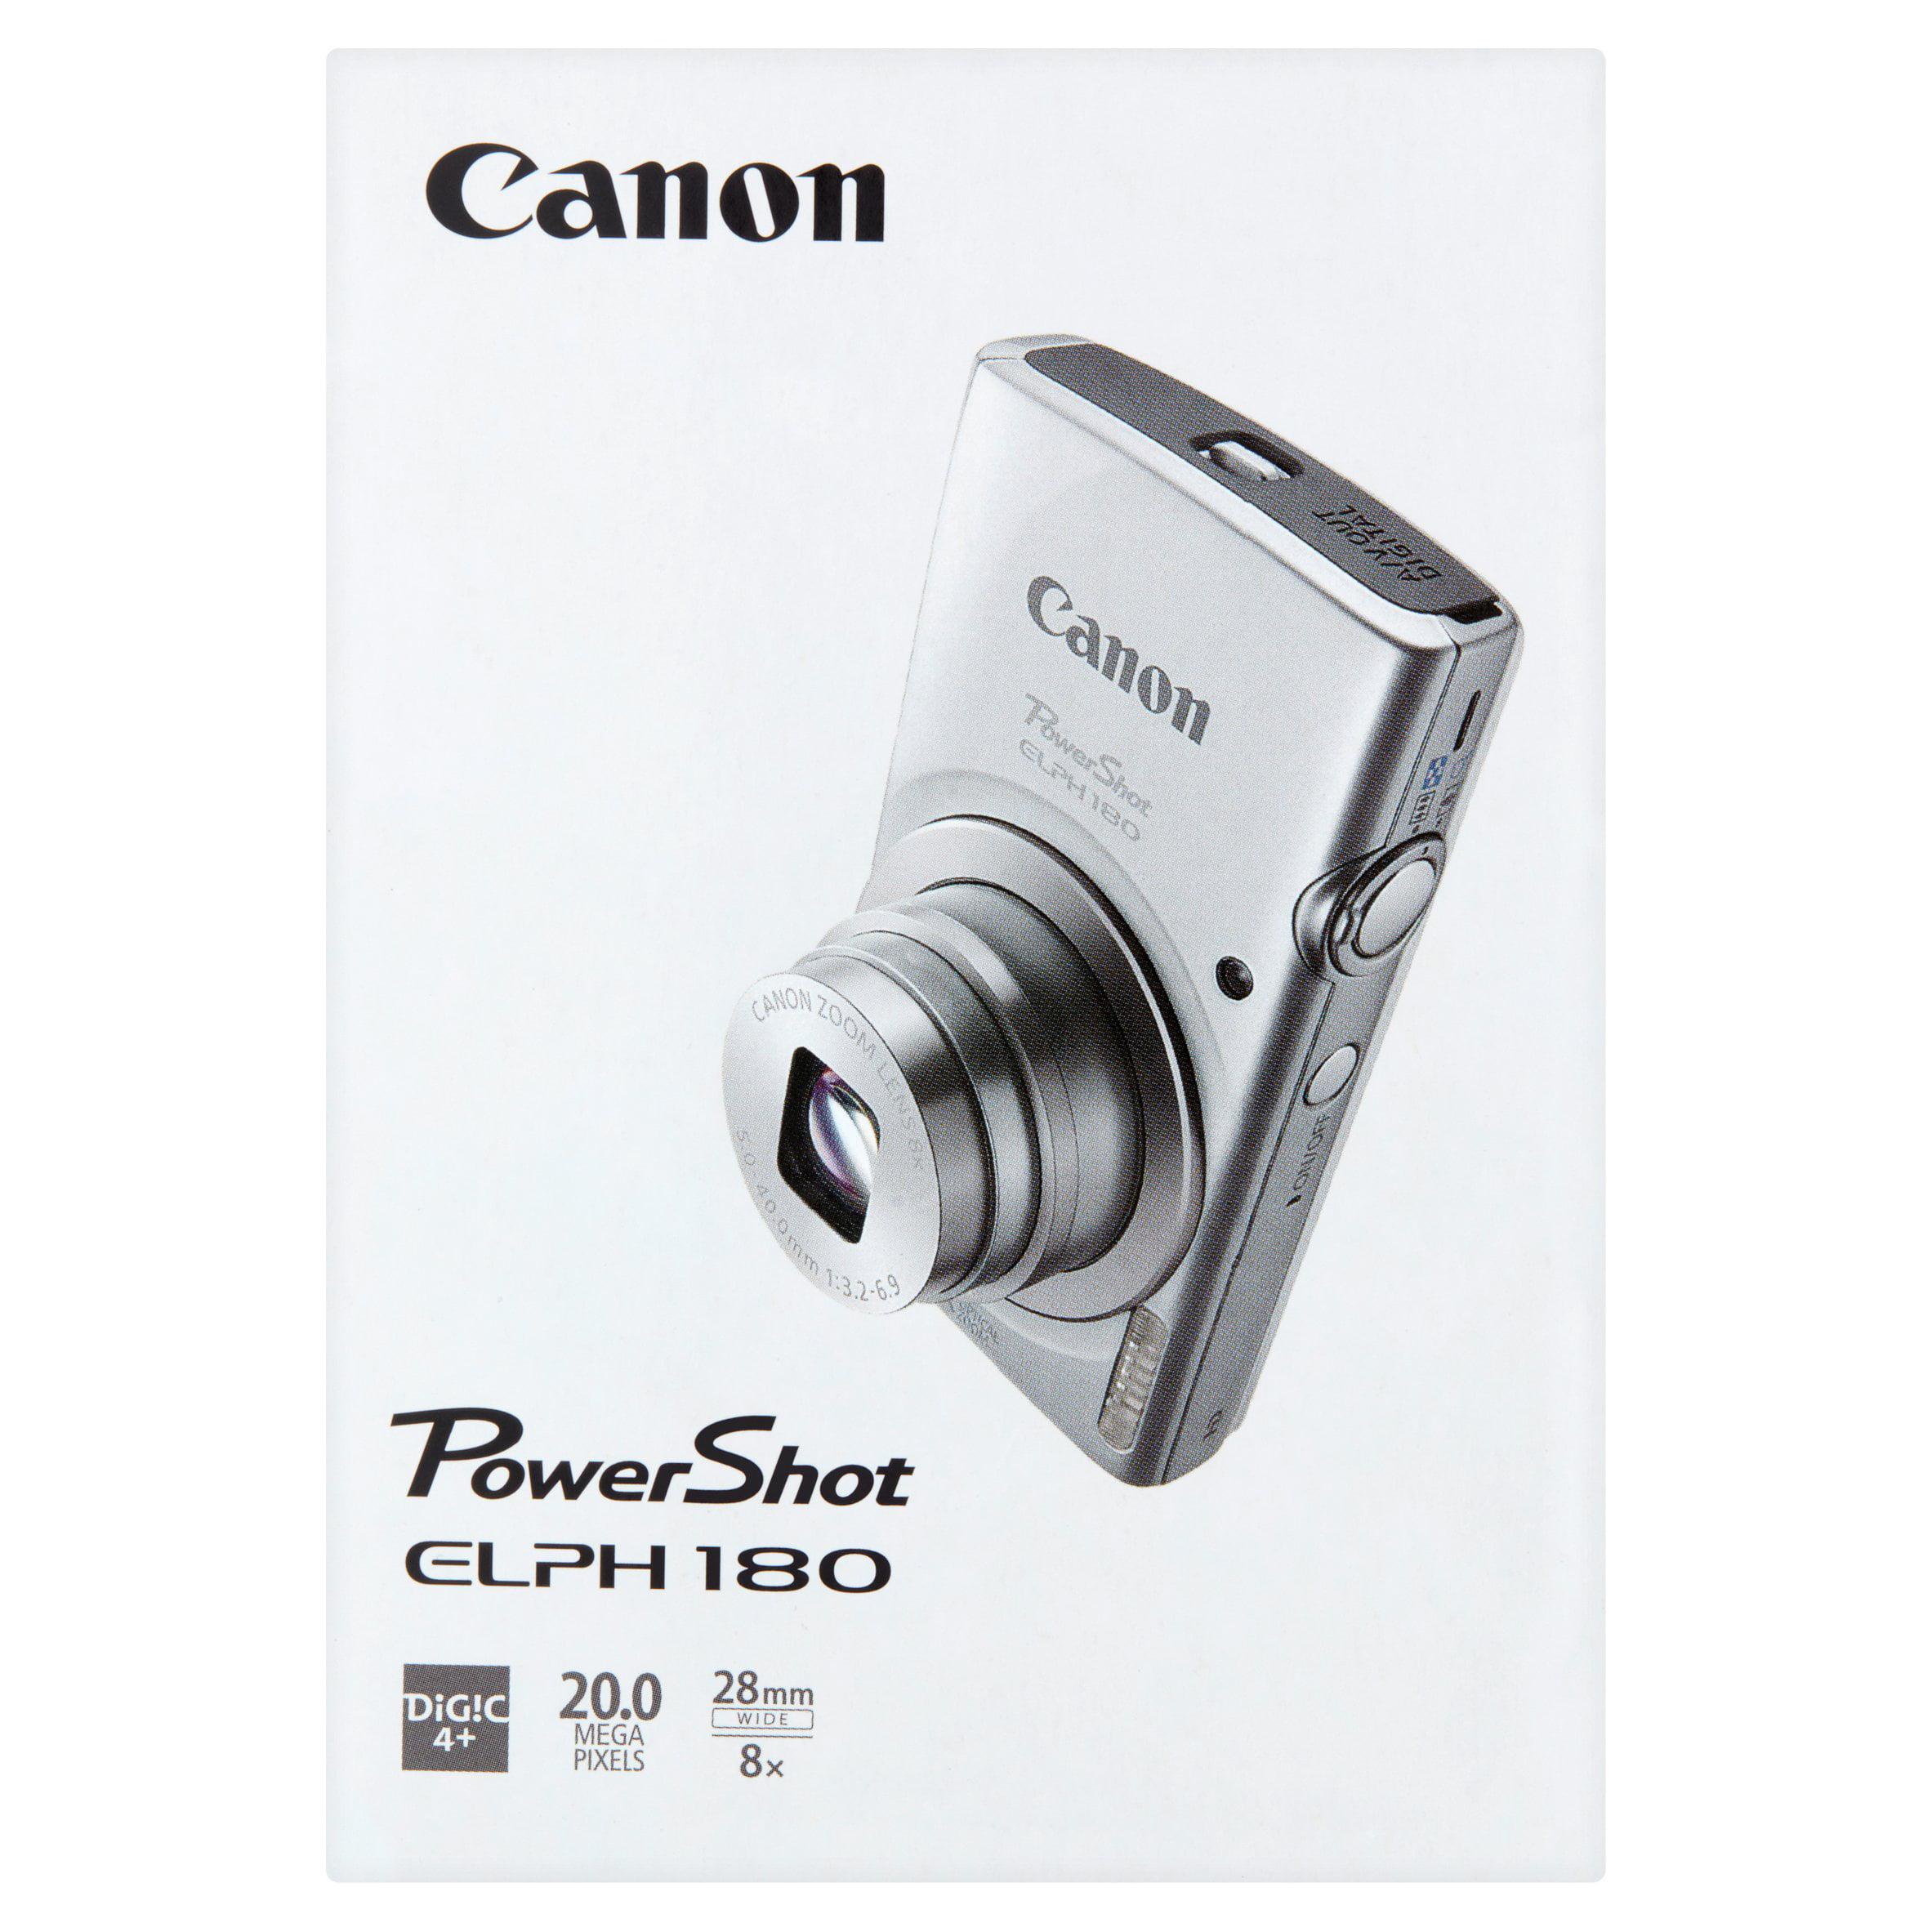 Canon Silver PowerShot ELPH 180 Digital Camera